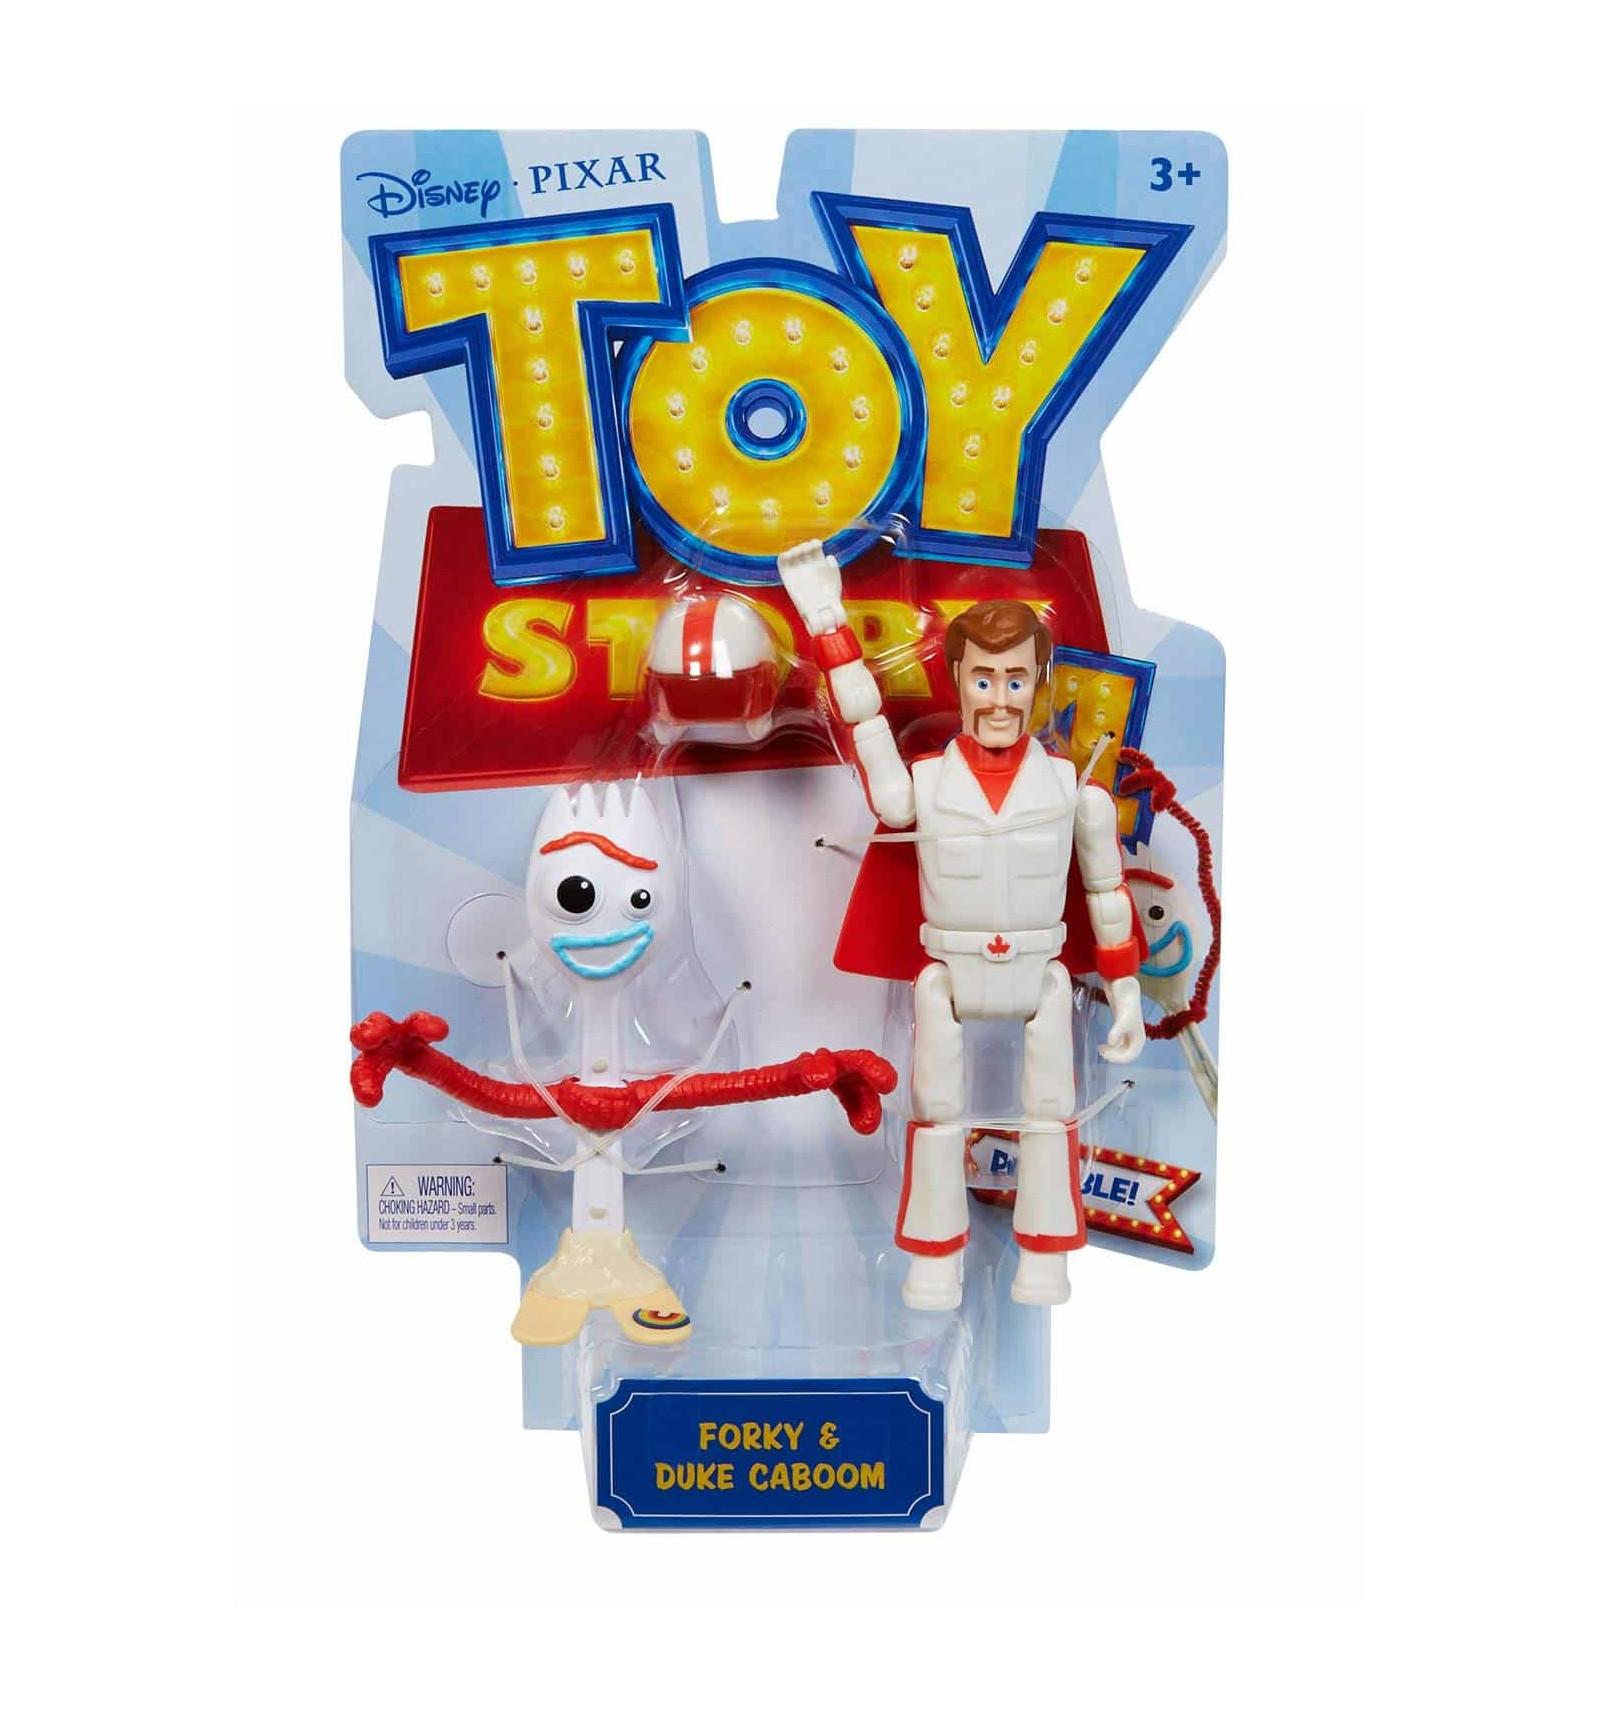 Toy Story 4 Figura Forky Y Duke Caboom Palaciodeljuguete Com